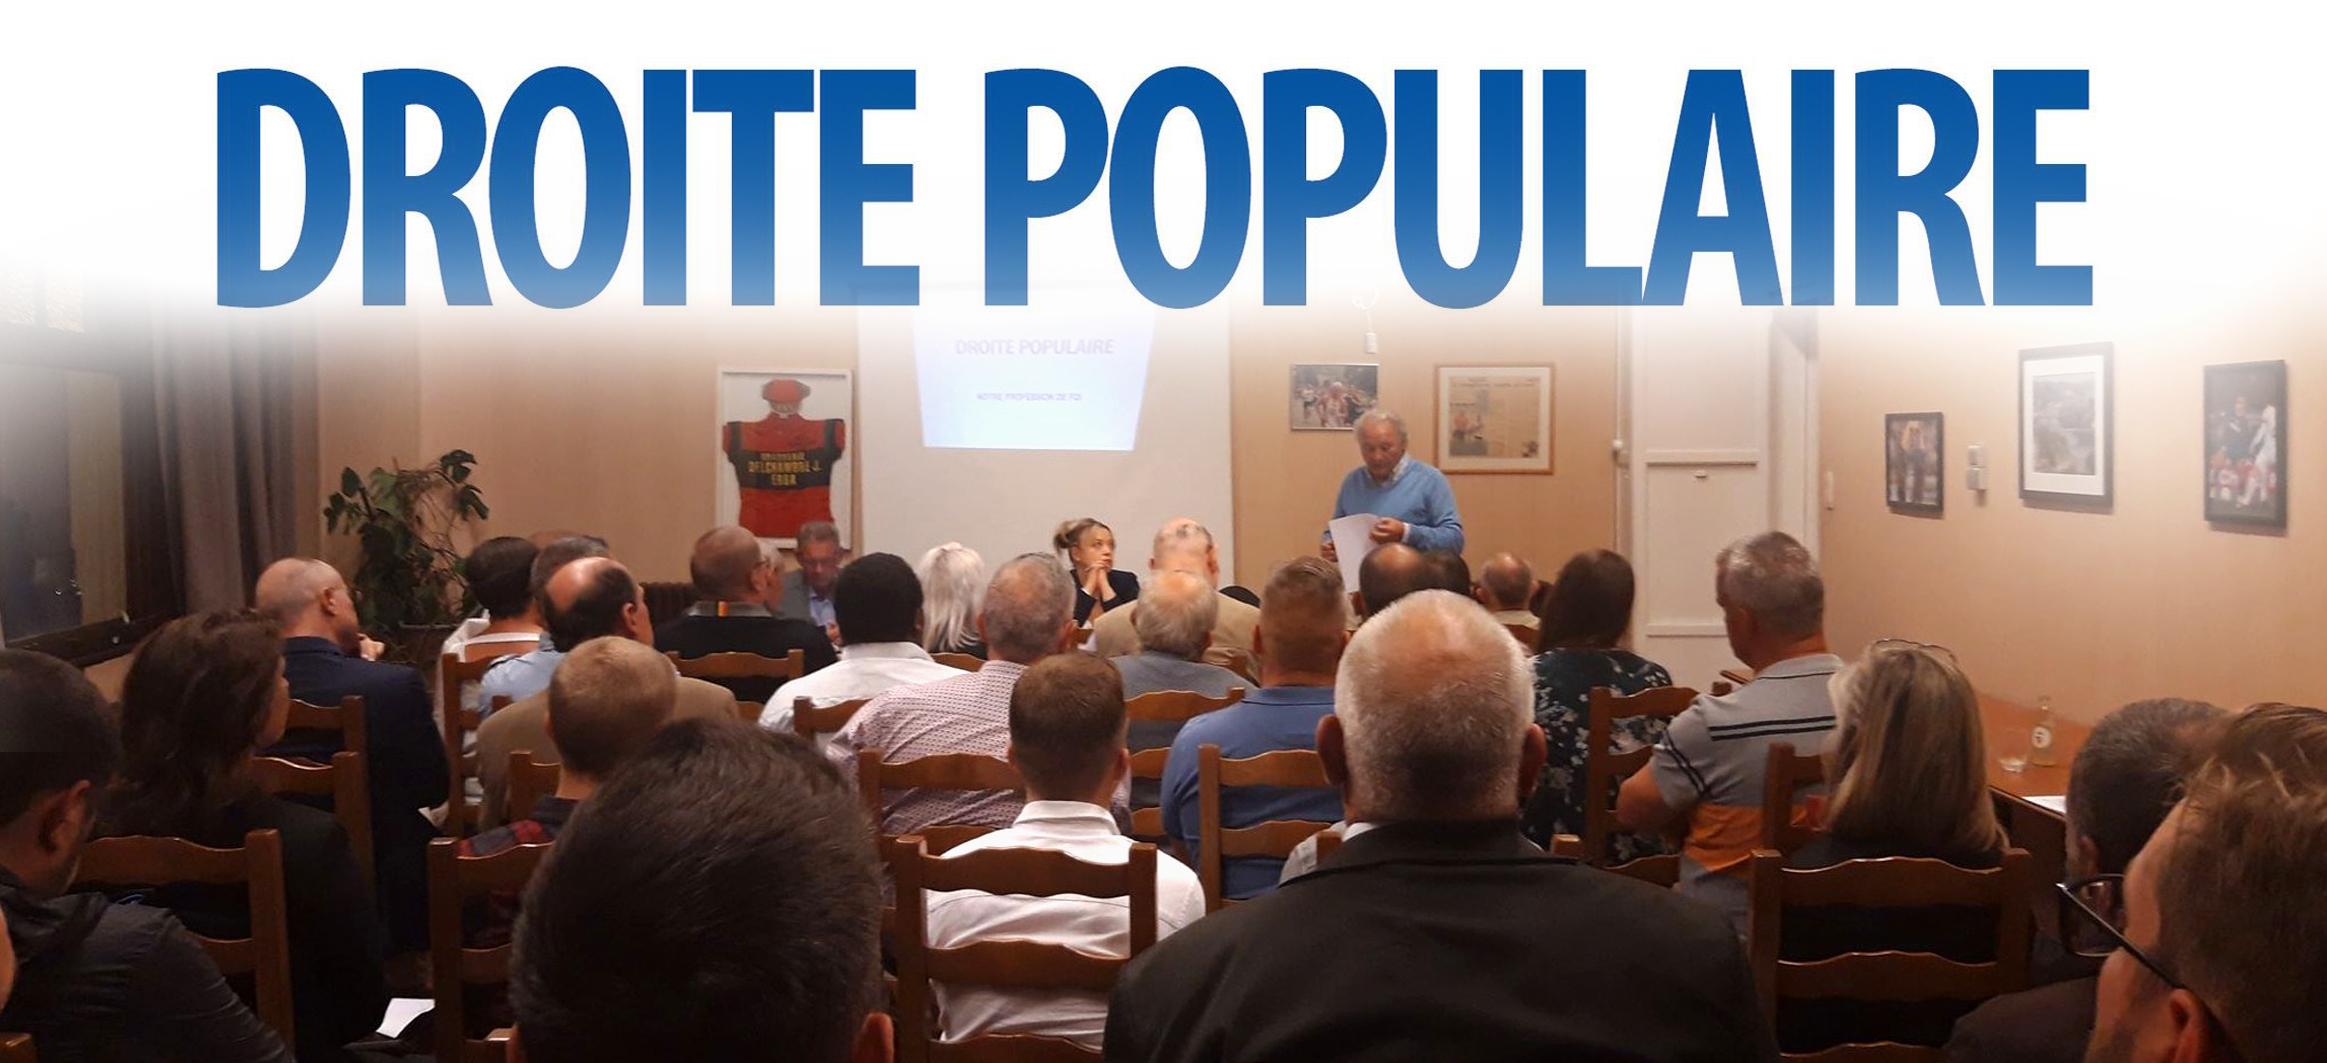 La DROITE POPULAIRE